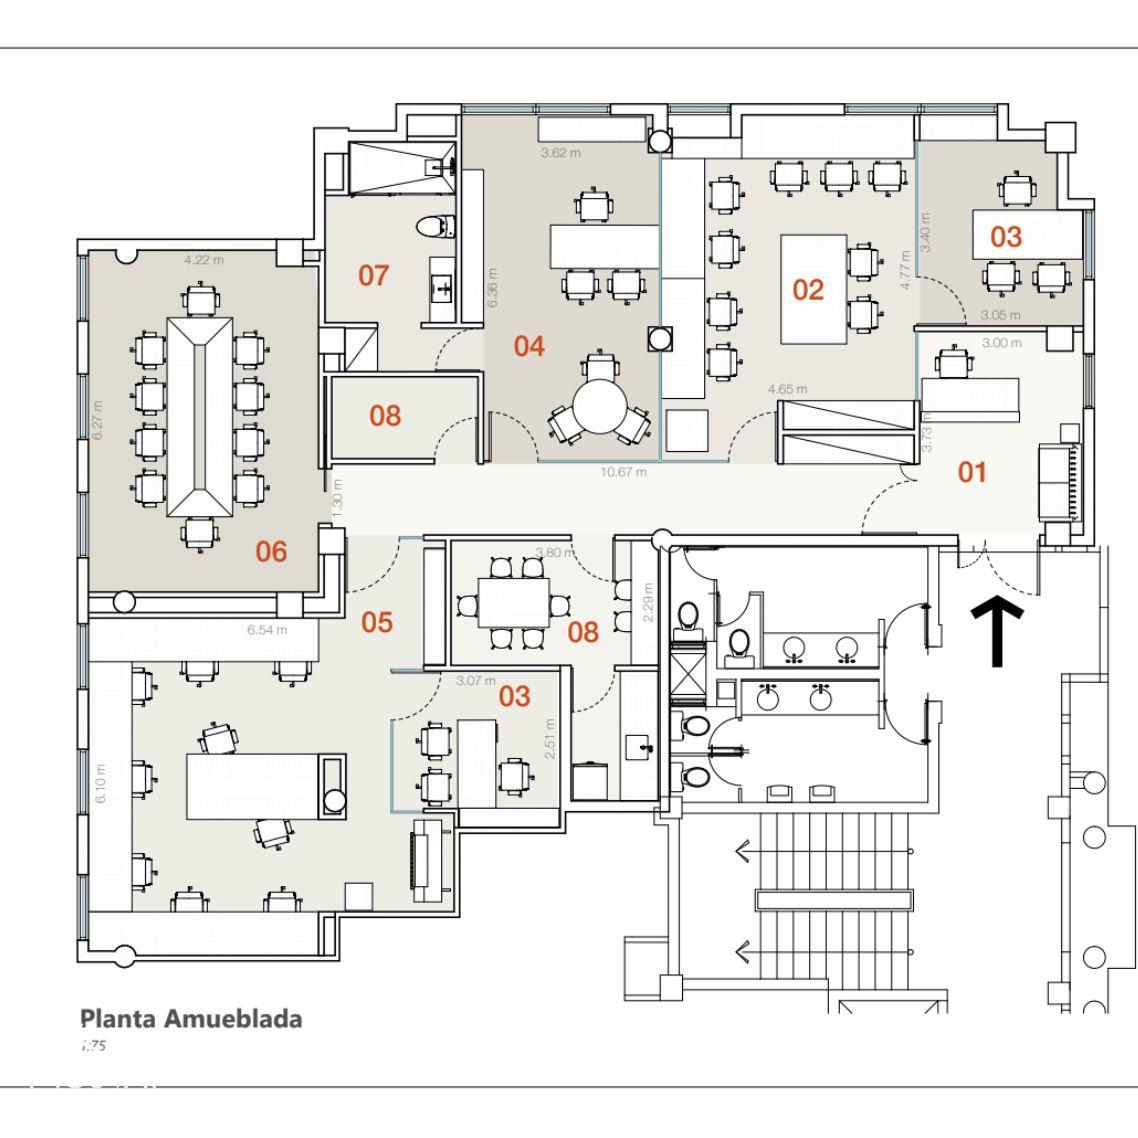 Moderna oficina amueblada en alquiler en Serralles 150392